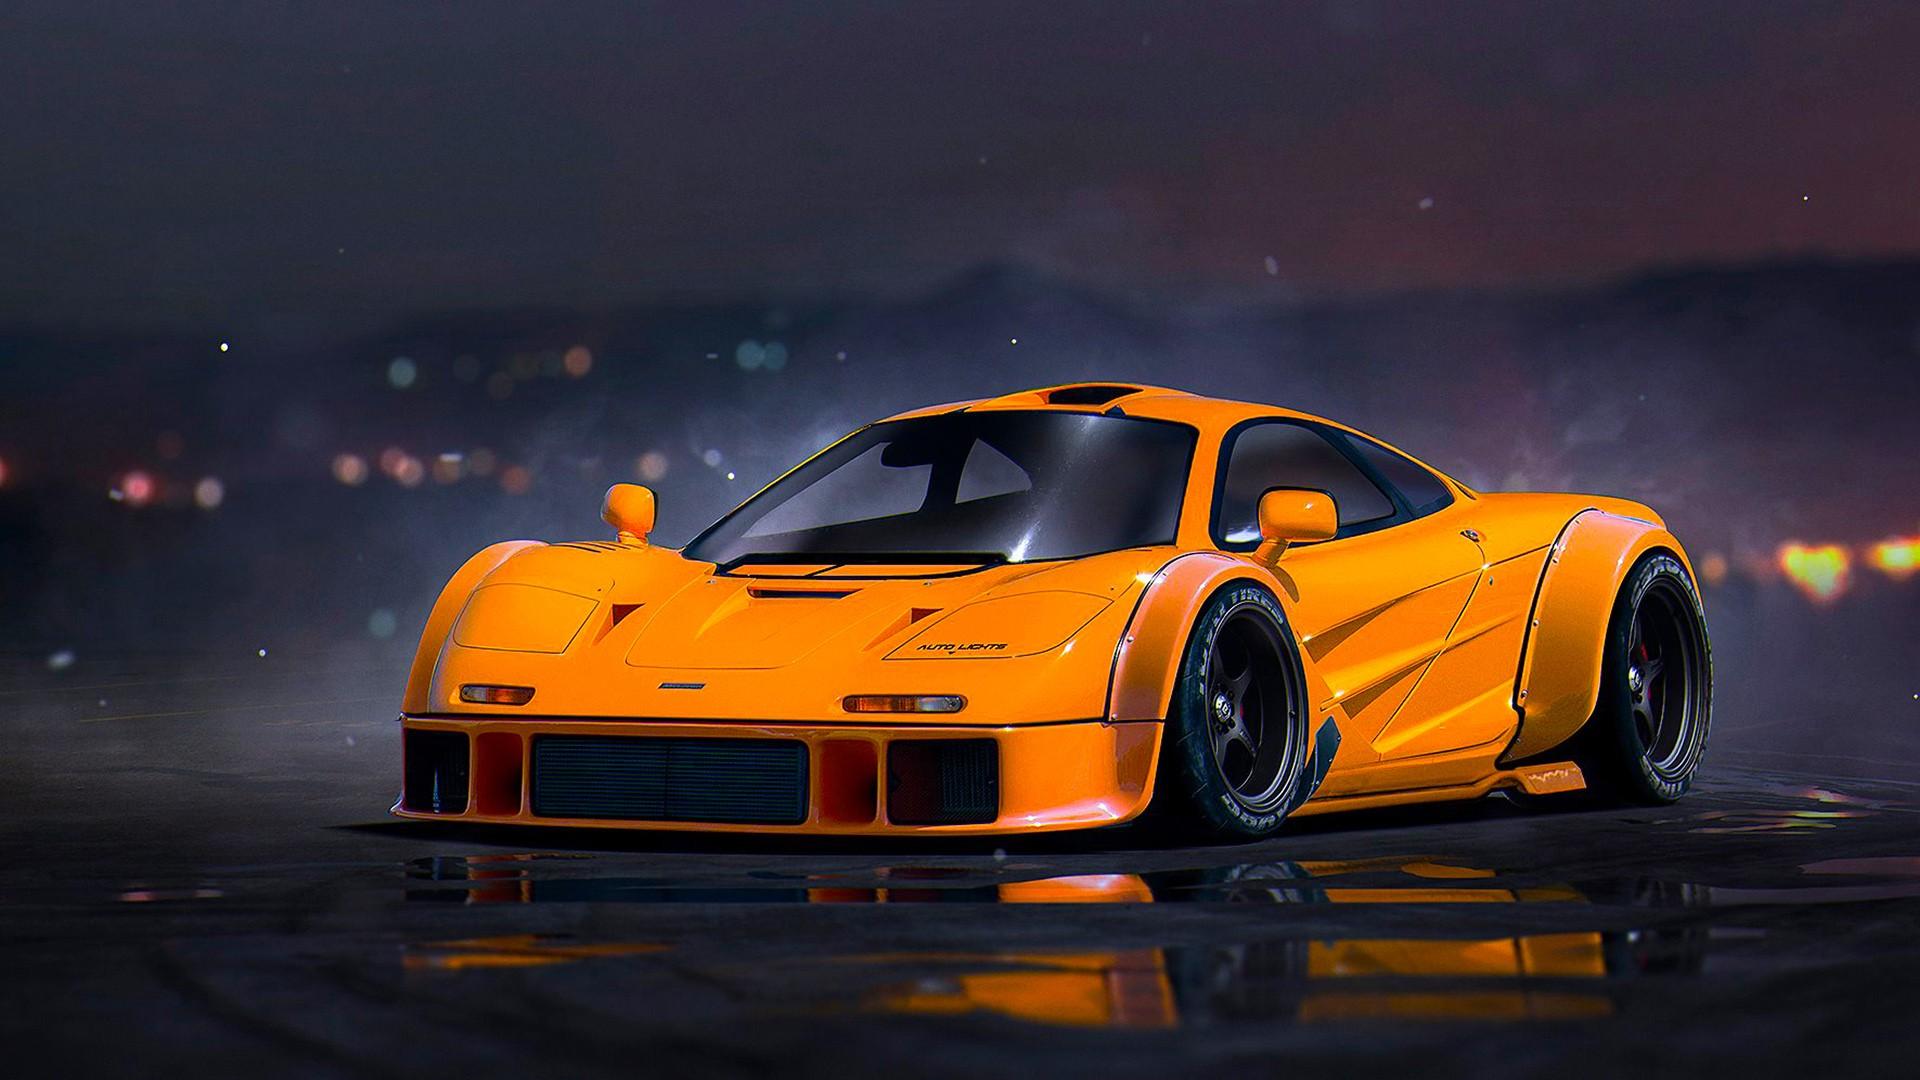 Ferrari Cars Wallpapers Hd Free Download Mclaren F1 Wallpaper Hd Car Wallpapers Id 5493